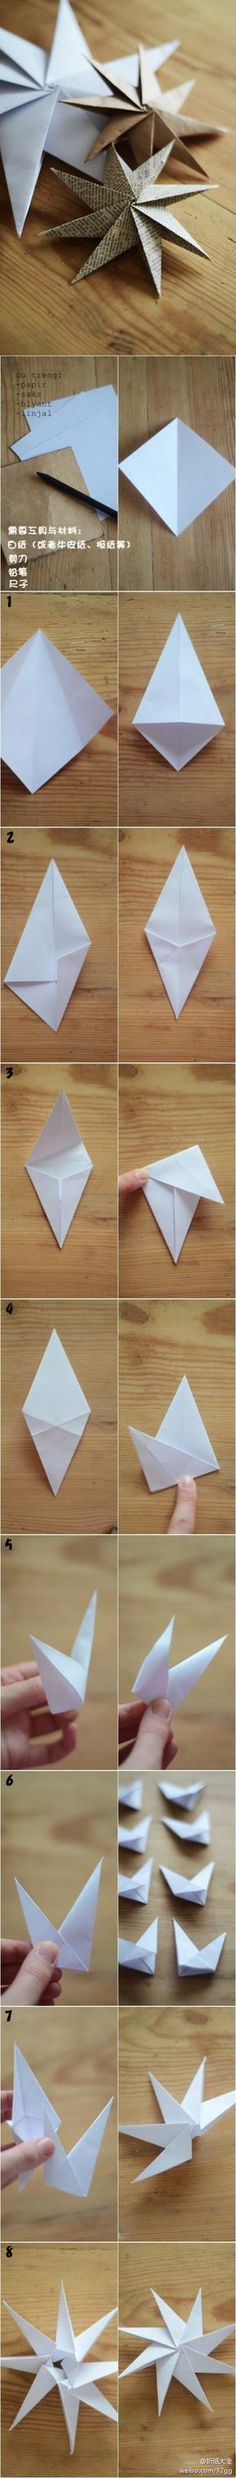 Fun DIY Craft Ideas – 72 Pics Weihnachtsstern aus Papier: This image has get… - Origami Origami Diy, Origami Stars, Origami Tutorial, Origami Paper, Diy Paper, Paper Crafting, Dollar Origami, Origami Instructions, Paper Paper